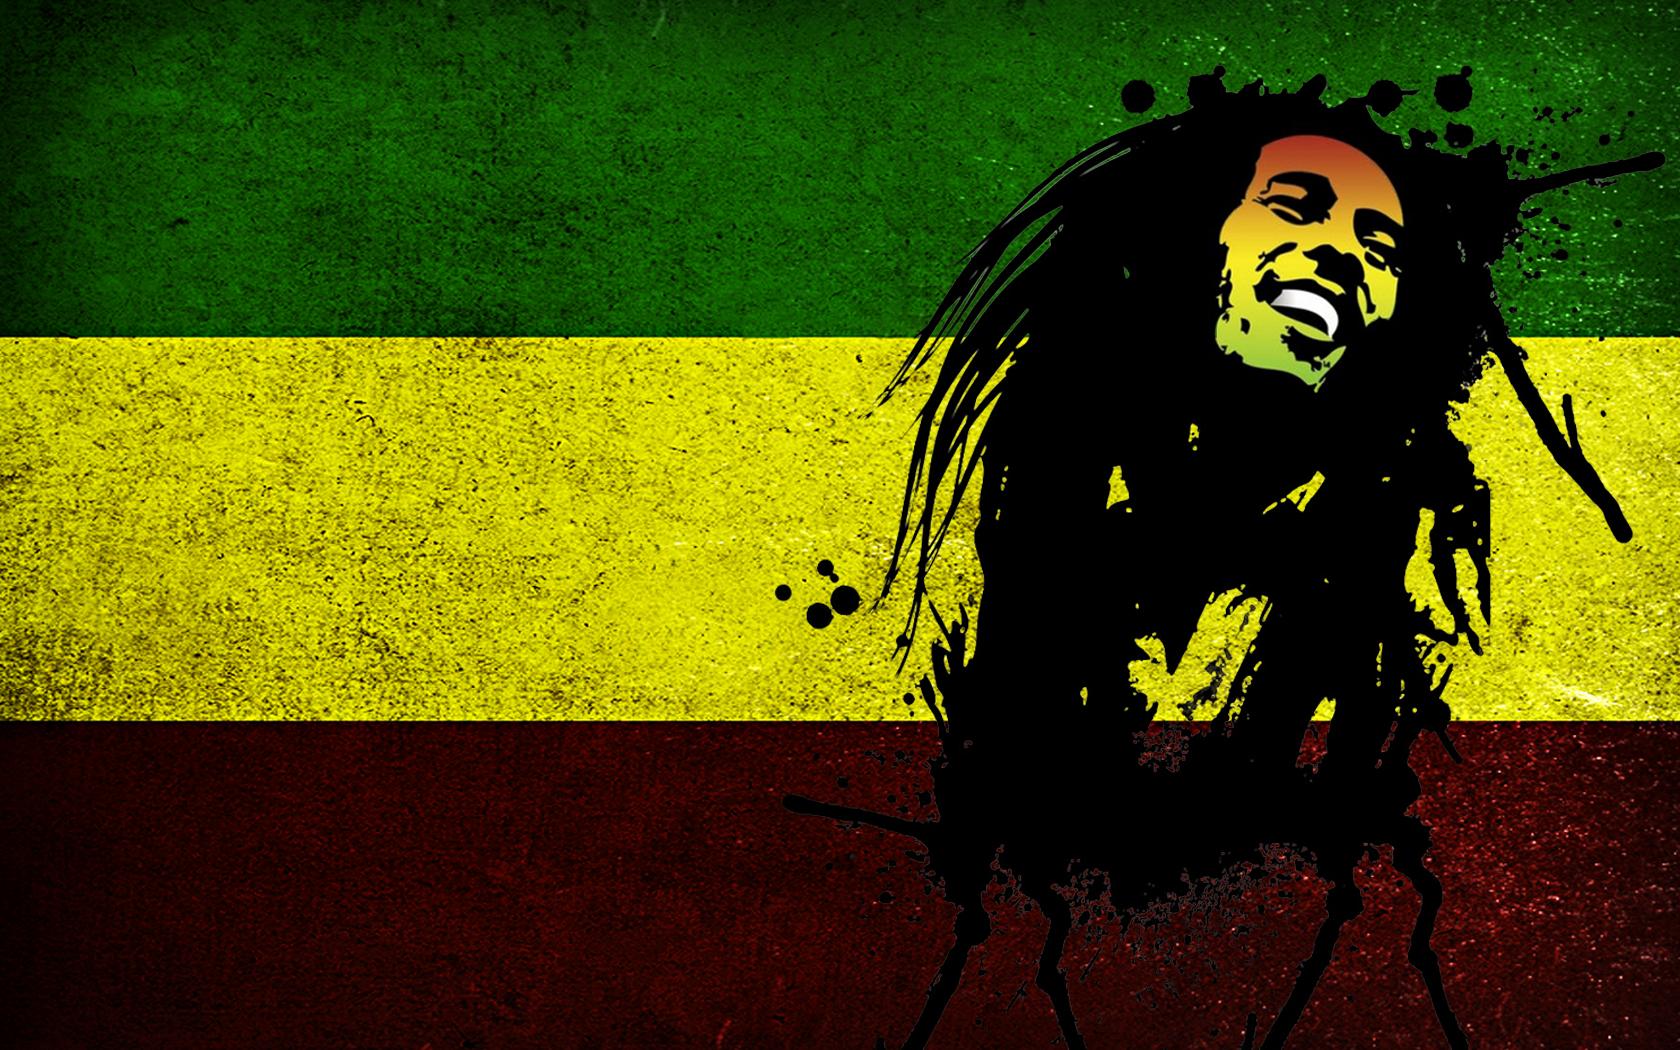 Bob Marley Reggae Music Wallpaper HD 11580 Wallpaper WallpaperLepi 1680x1050